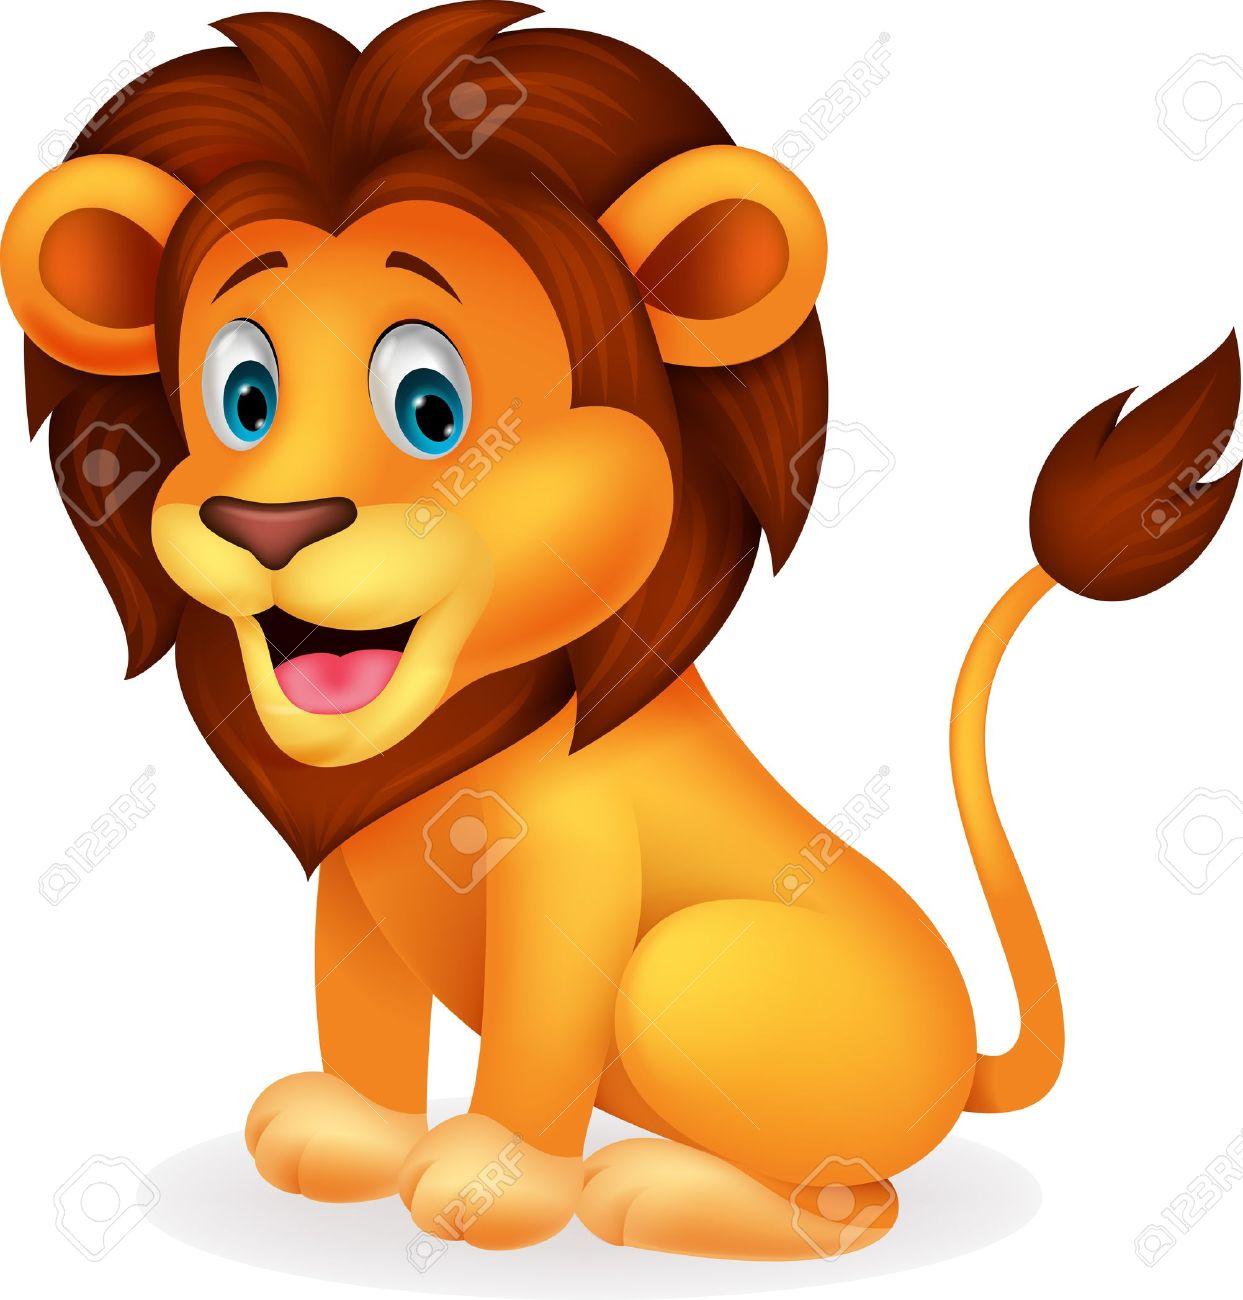 Uncategorized Cute Lion Drawing cute lion cartoon drawing safari drawing